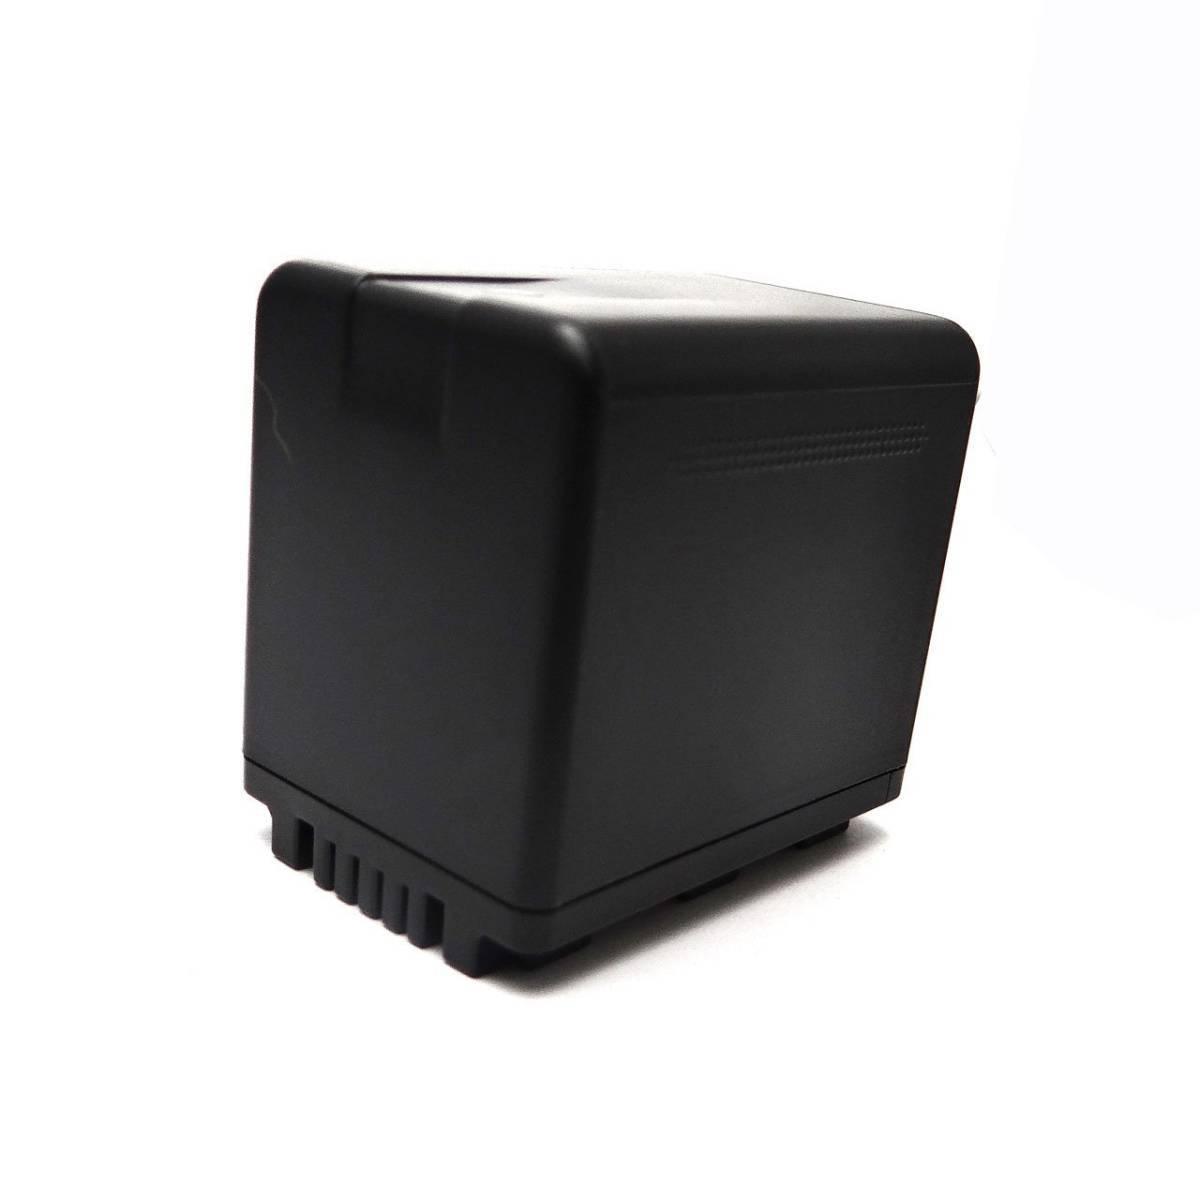 Panasonicパナソニック VW-VBK360-K互換バッテリーと互換デュアルUSBチャージャーHC-V700M/HC-V600M/HC-V300M/HC-V100M/HDC-TM90_画像3